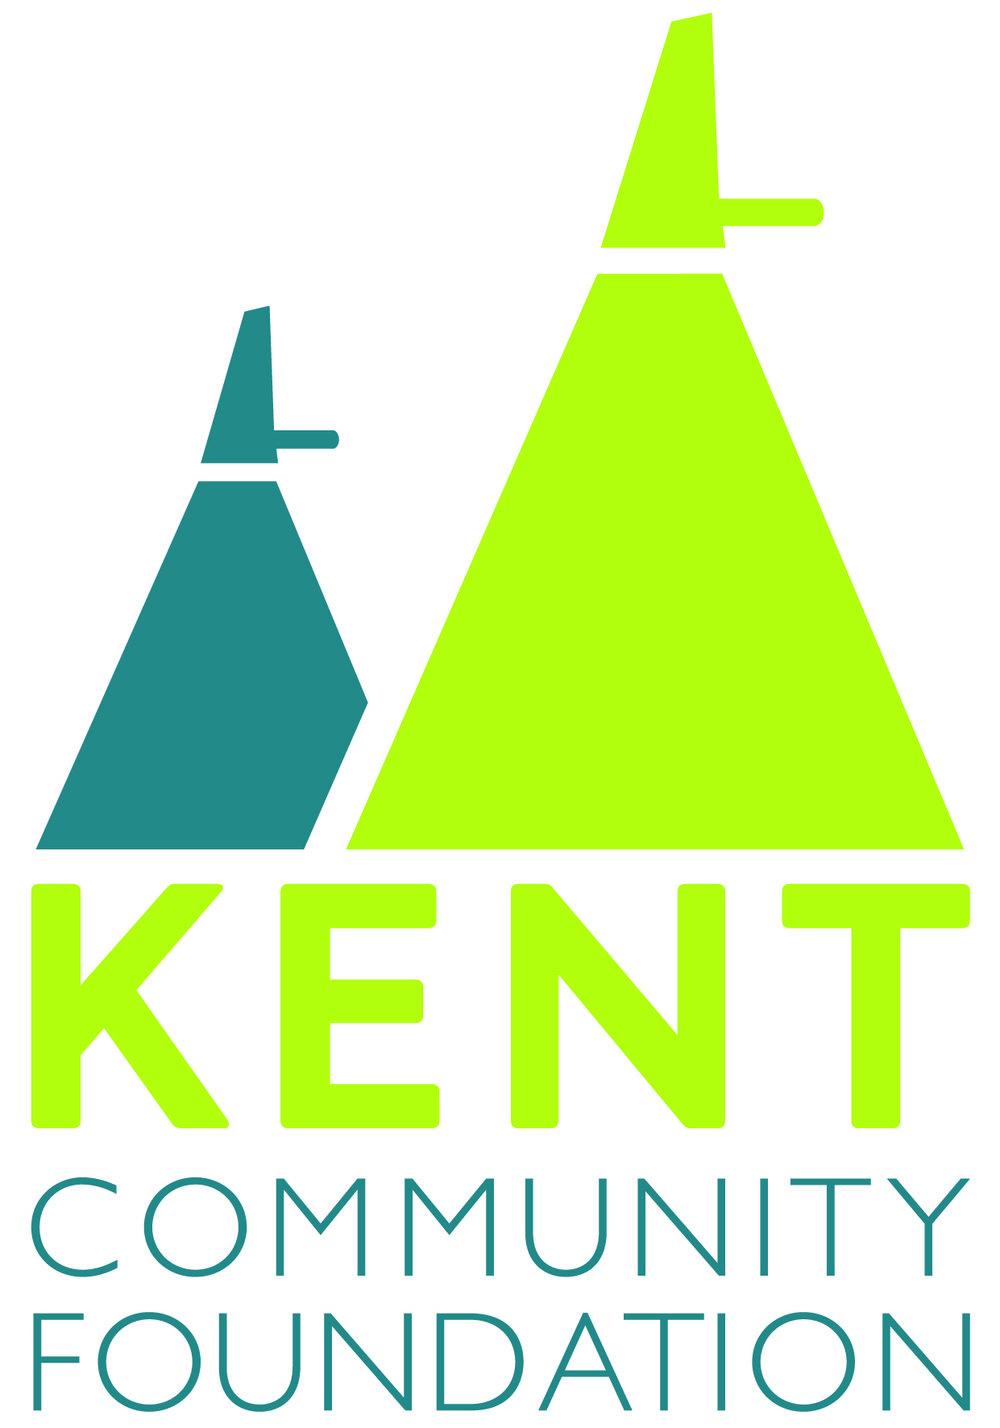 KCF-Logo-CMYK (USE)-2.jpg